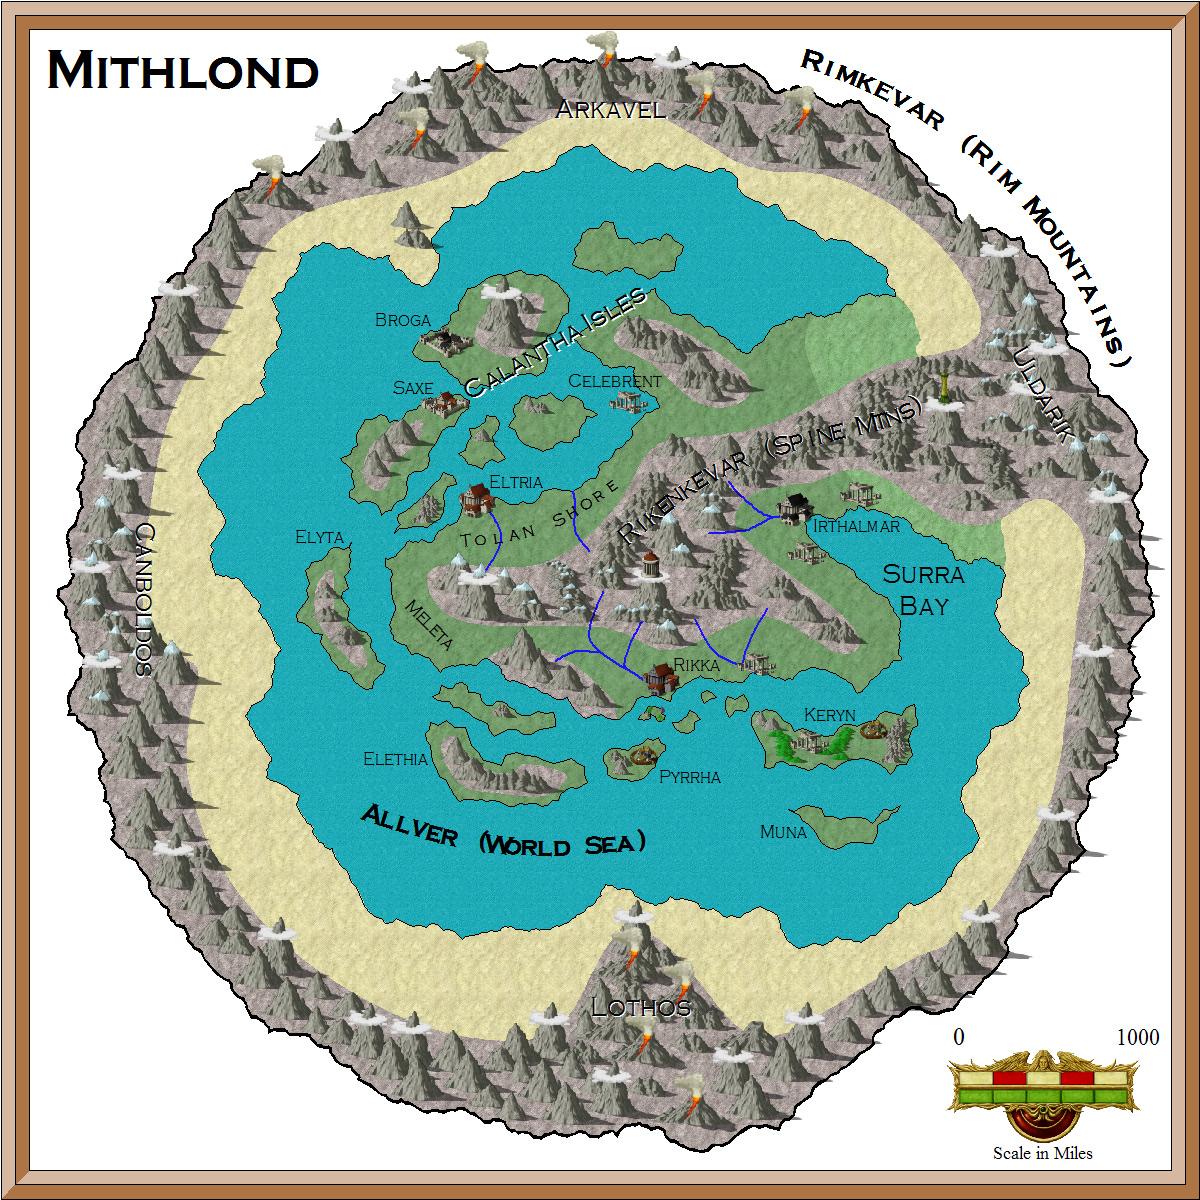 Mithlond.JPG